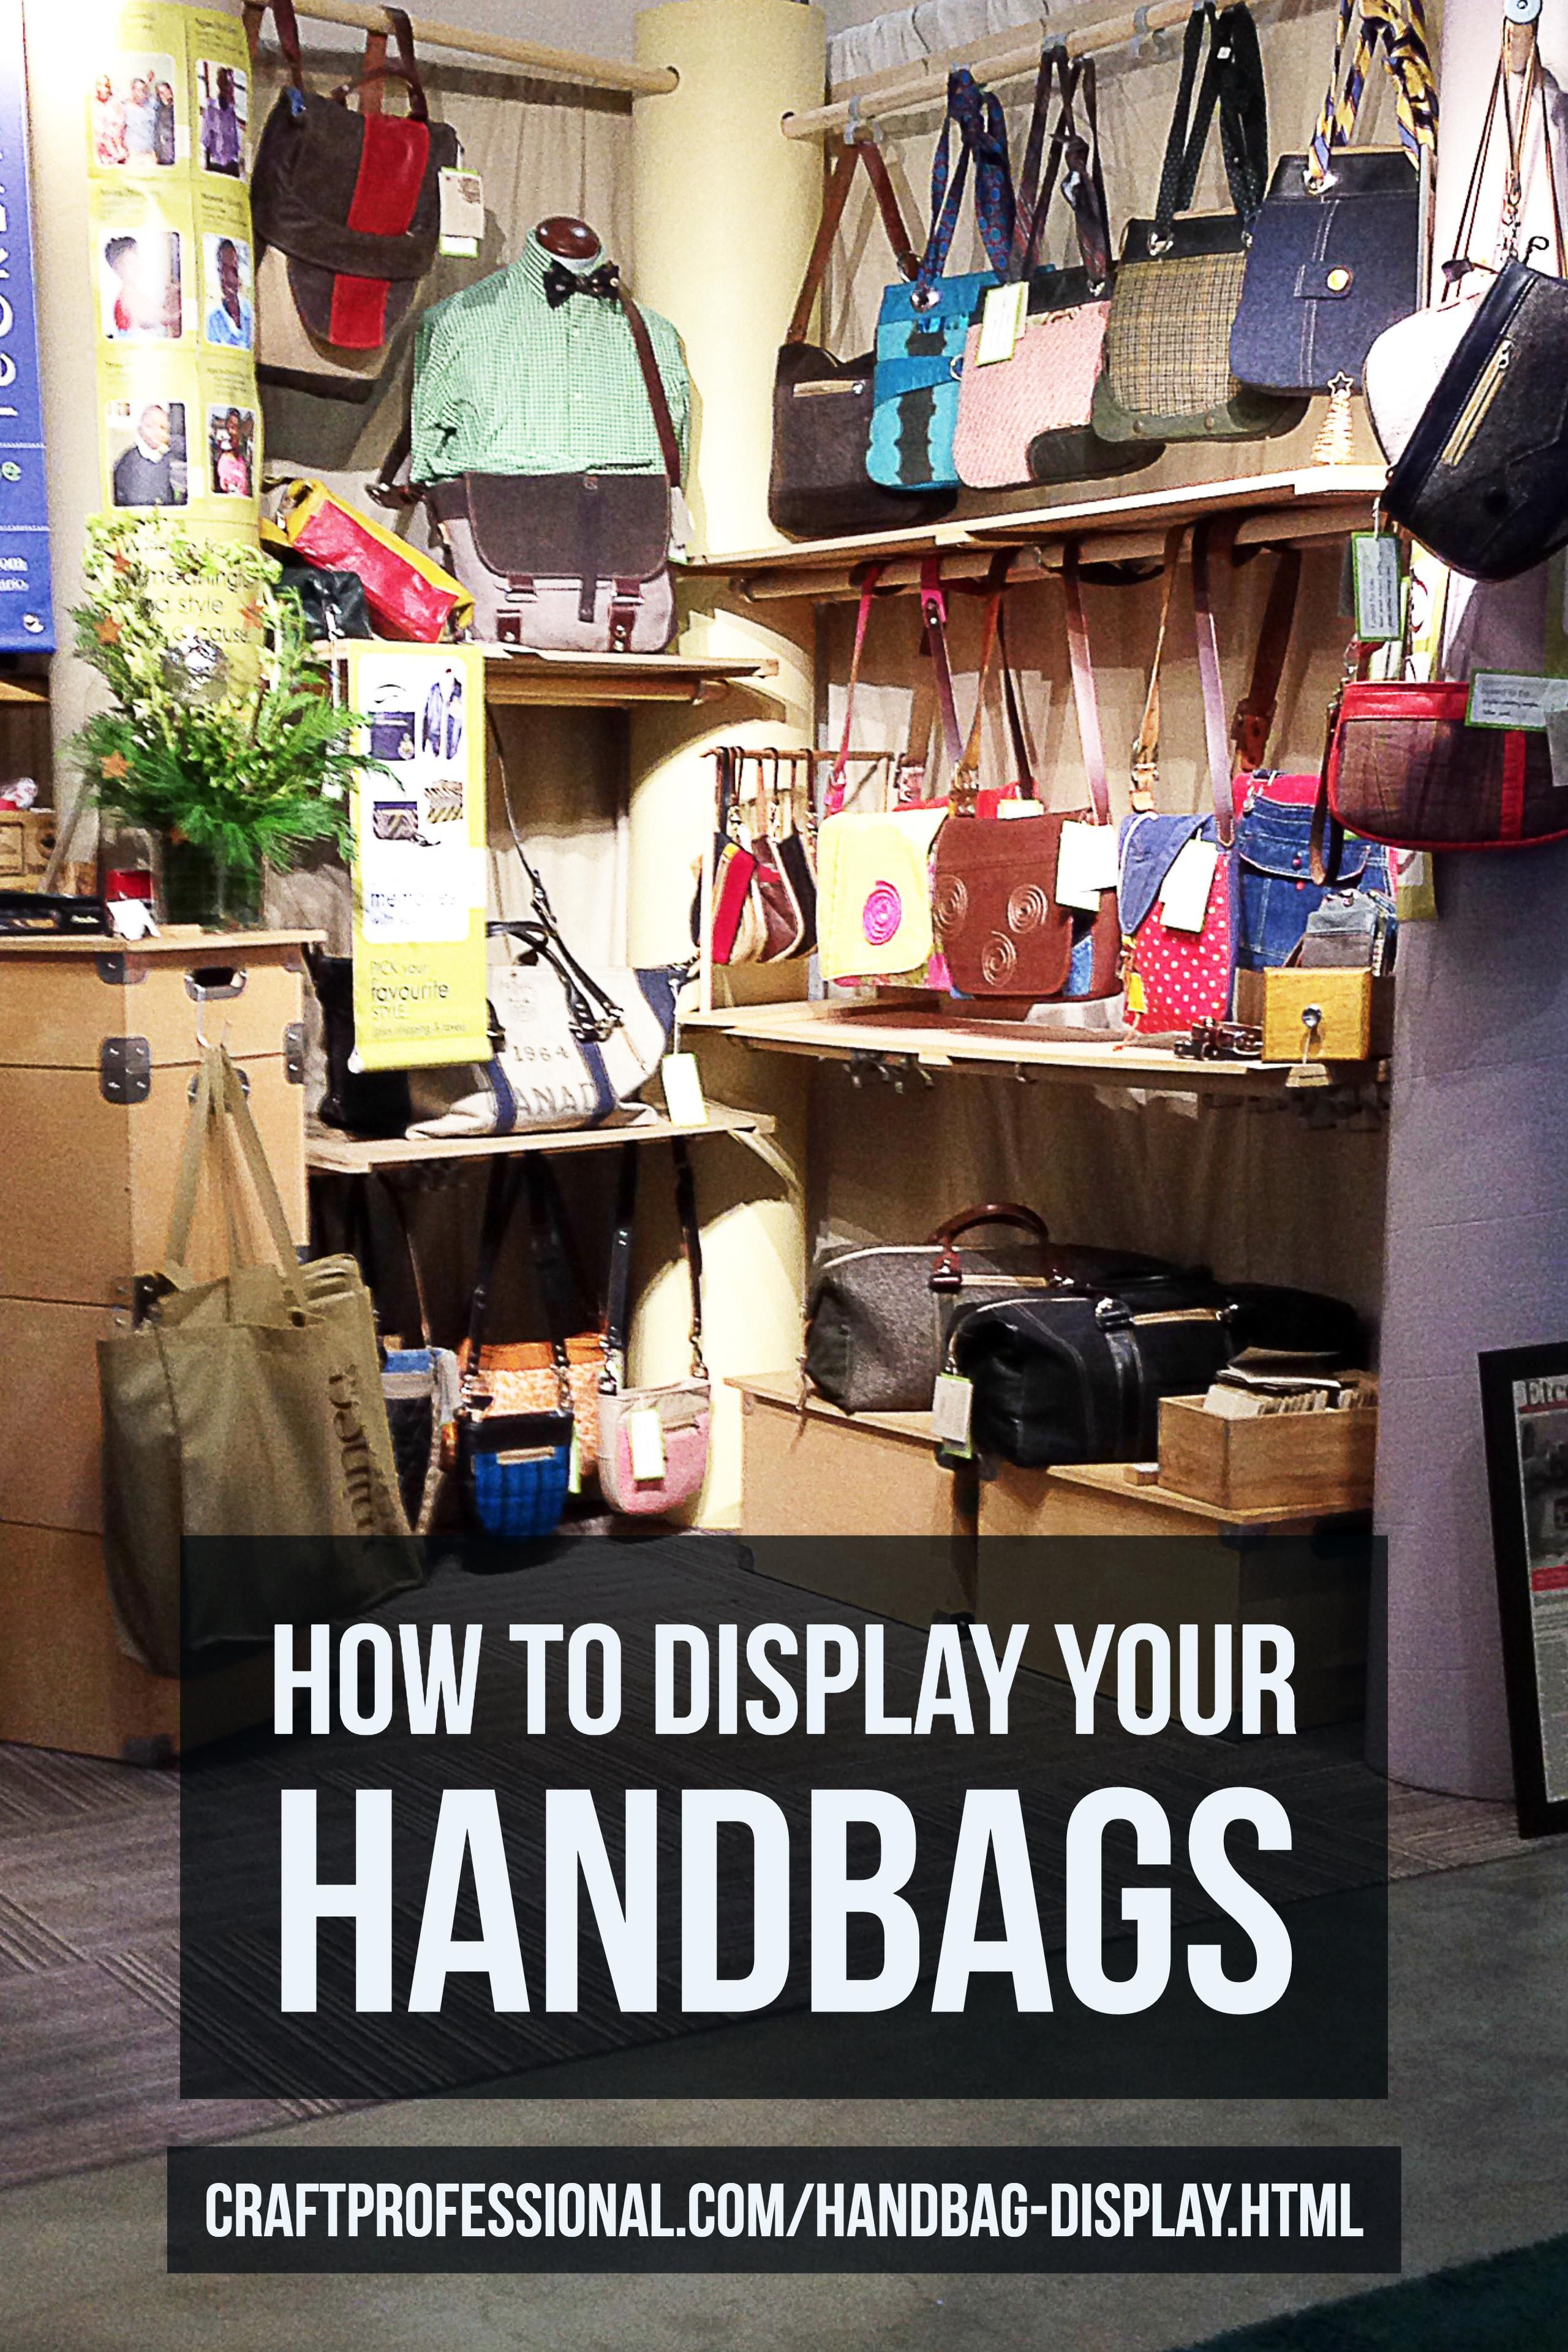 9 Photos Of Handbag Displays At Craft Shows Click Through For Lots Inspiration